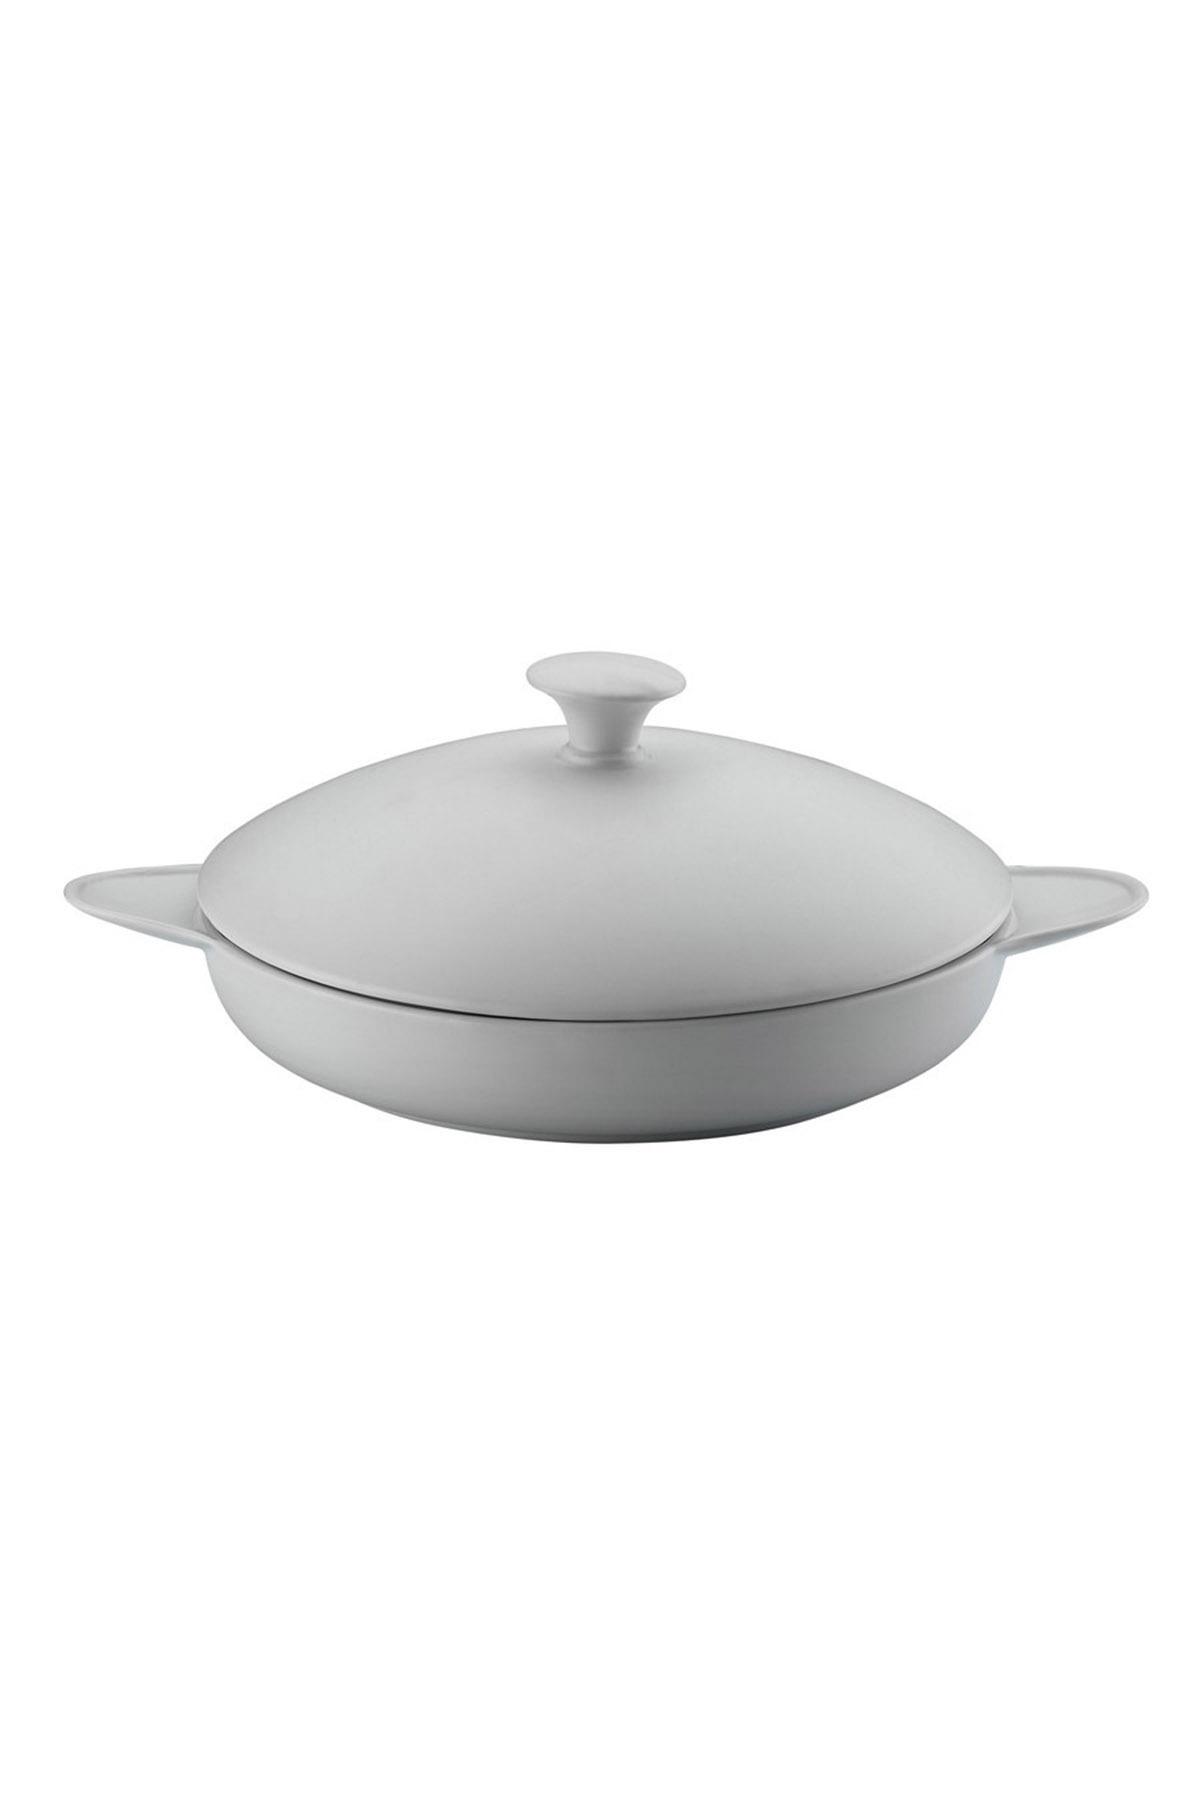 Kütahya Porselen - Porflame Porselen 21 cm Kapaklı Tava